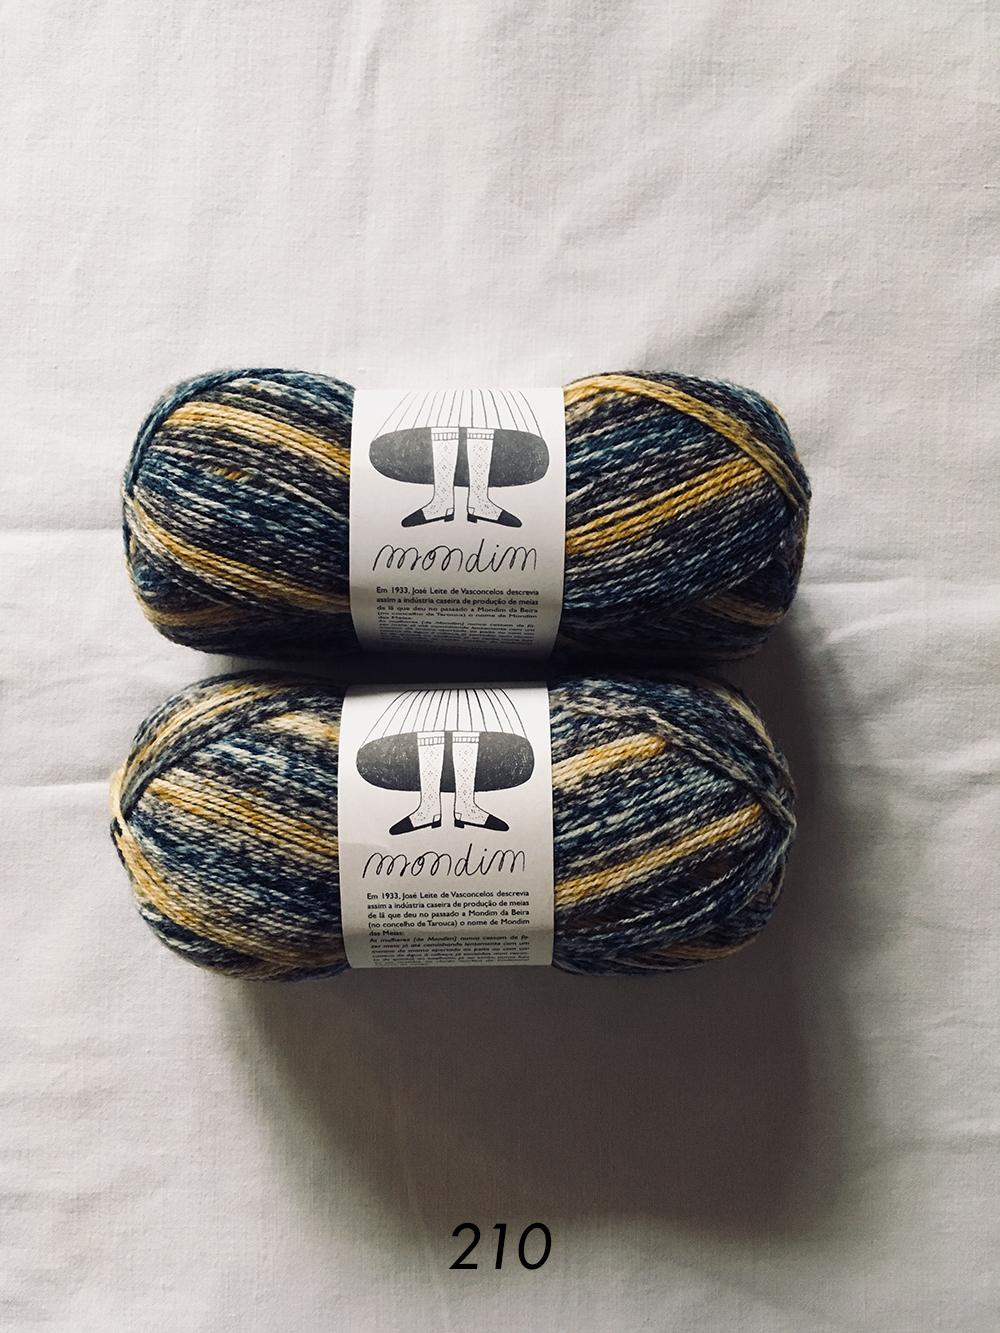 retrosaria_mondim_210_wool_done_knitting.jpg